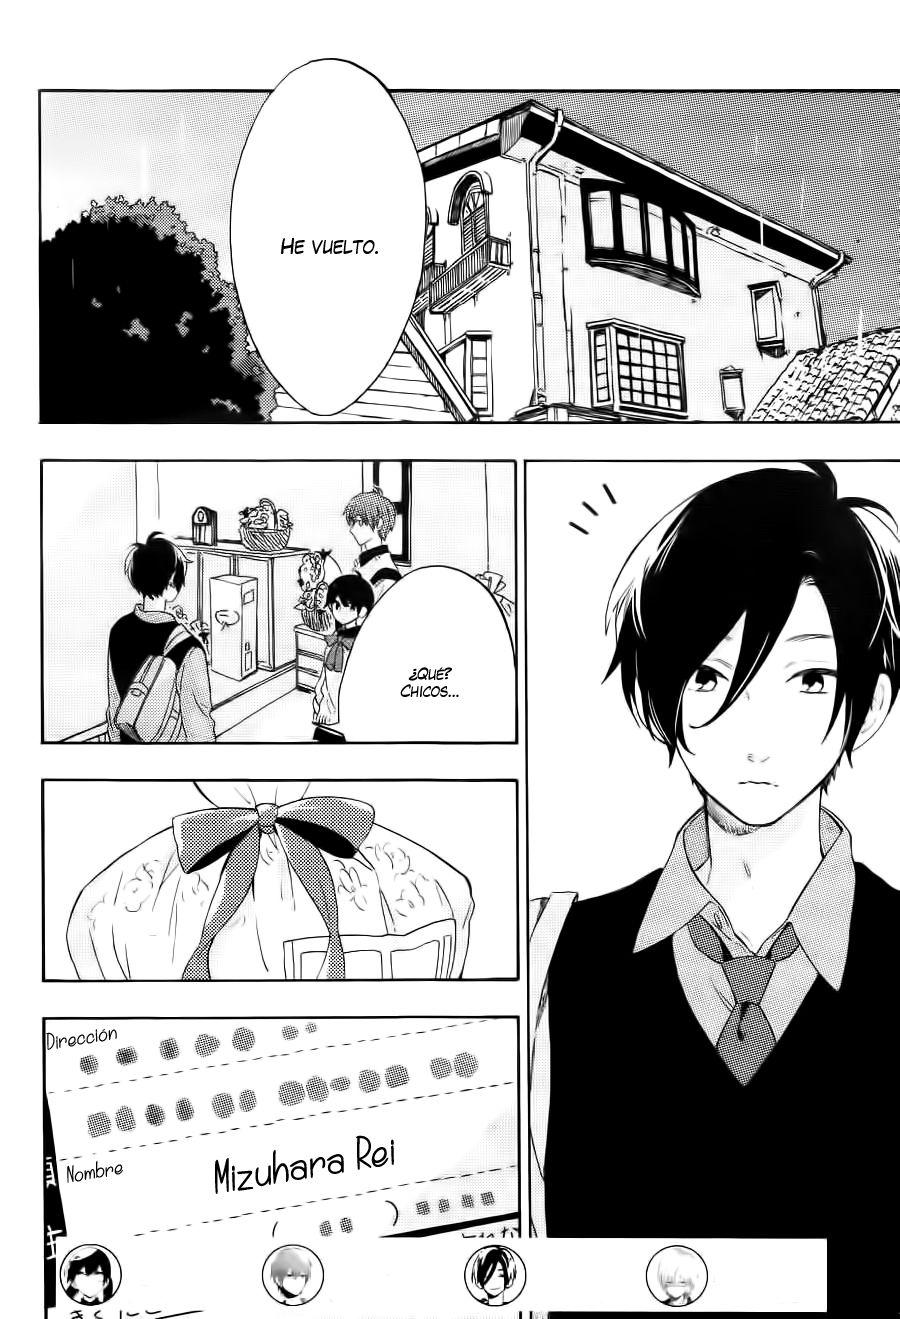 http://c5.ninemanga.com/es_manga/19/18451/459561/e564204118c7b090cc3c5af475b5db60.jpg Page 4